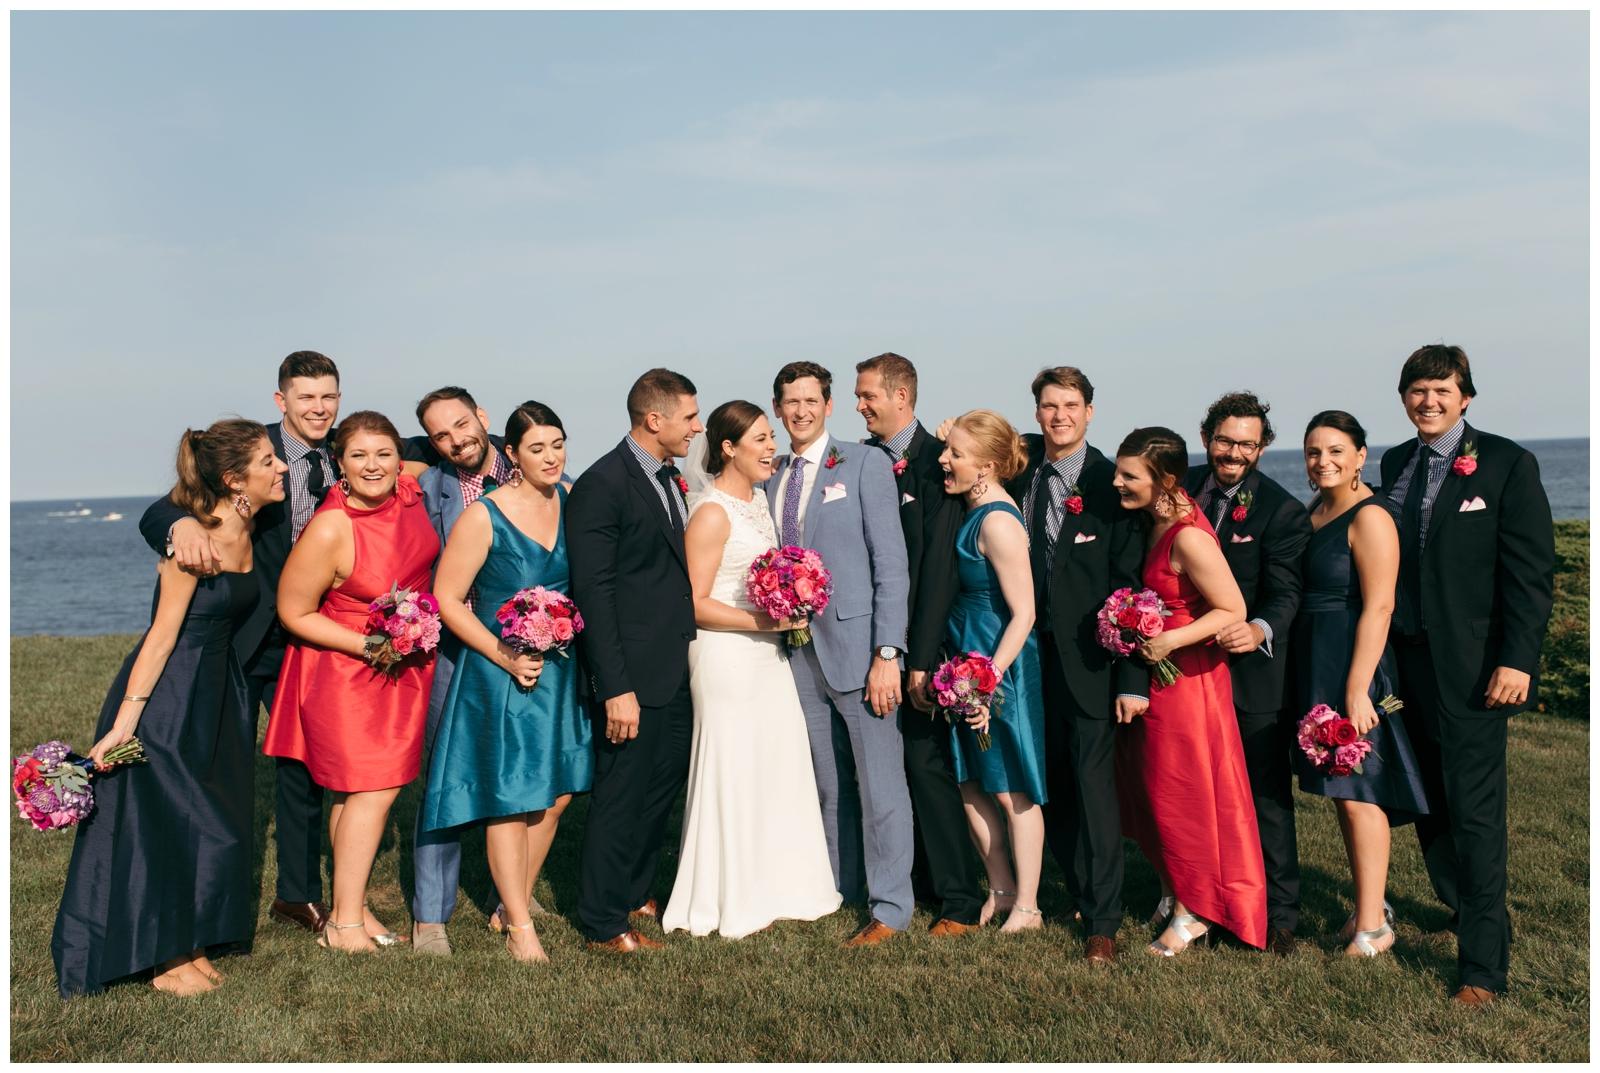 Bailey-Q-Photo-Backyard-Wedding-South-Shore-Boston-Wedding-Photographer-066.jpg